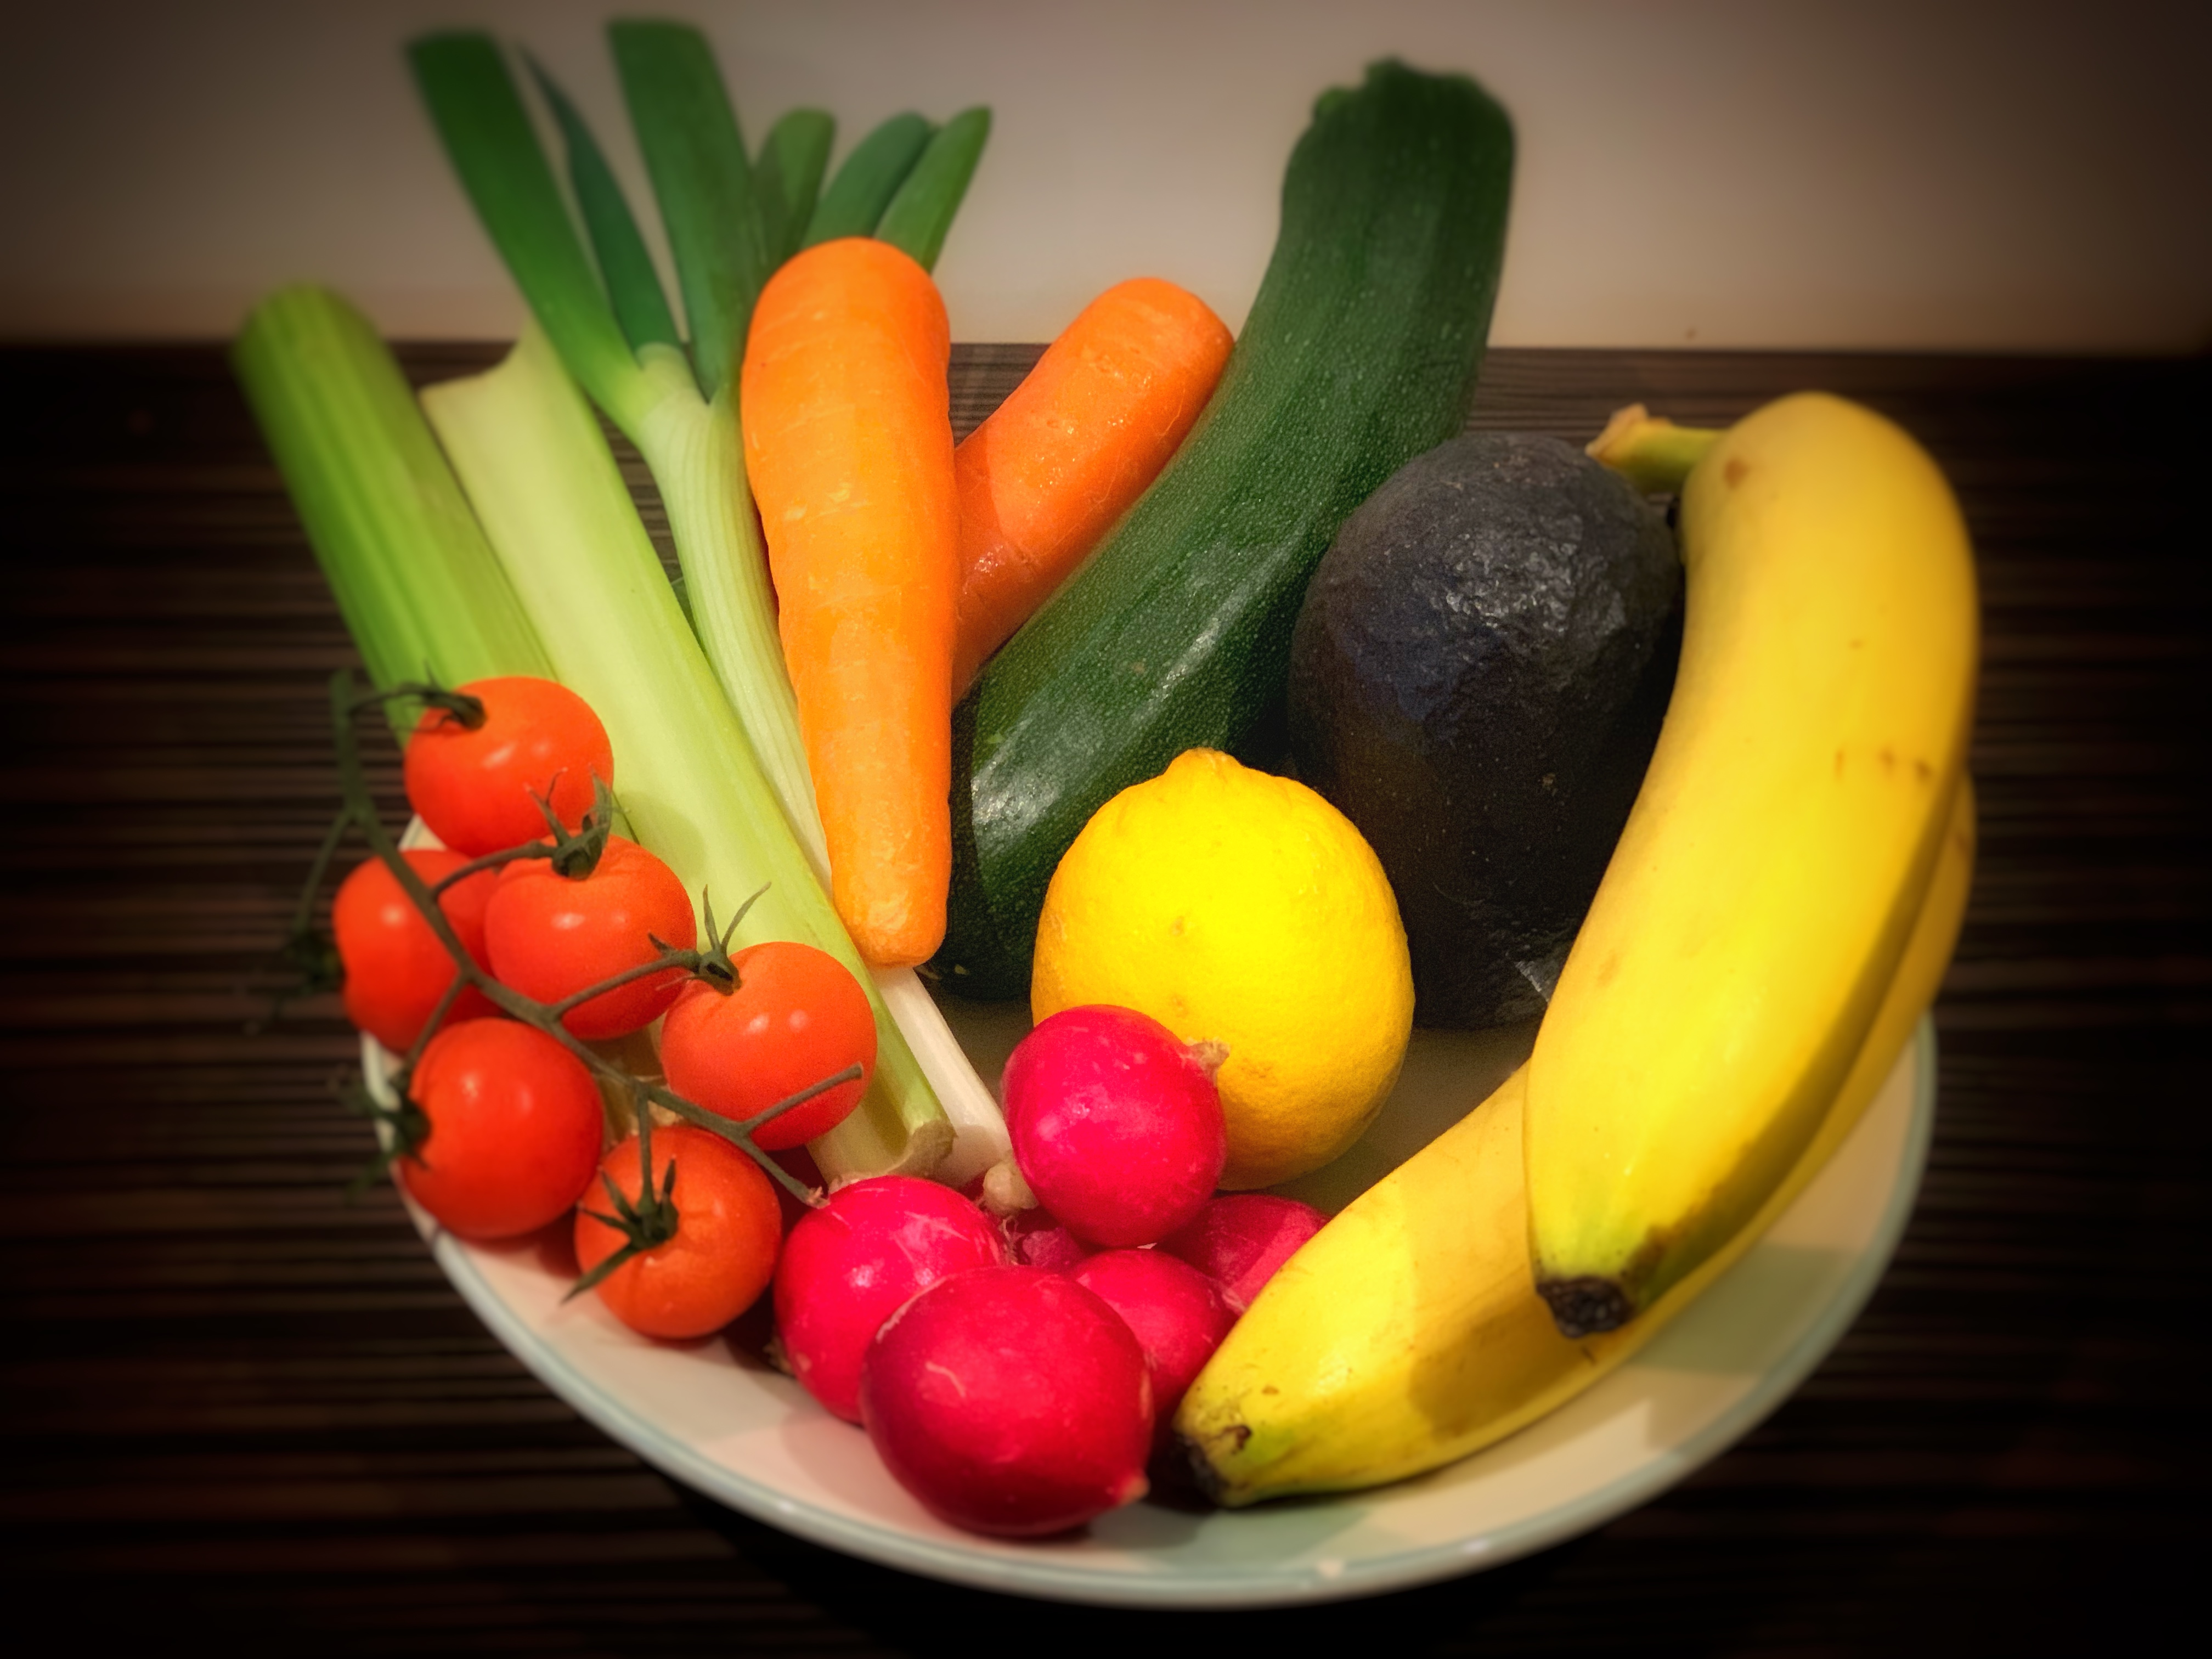 asda, ocado, waitrose, sainsburys, groceries, shopping, online